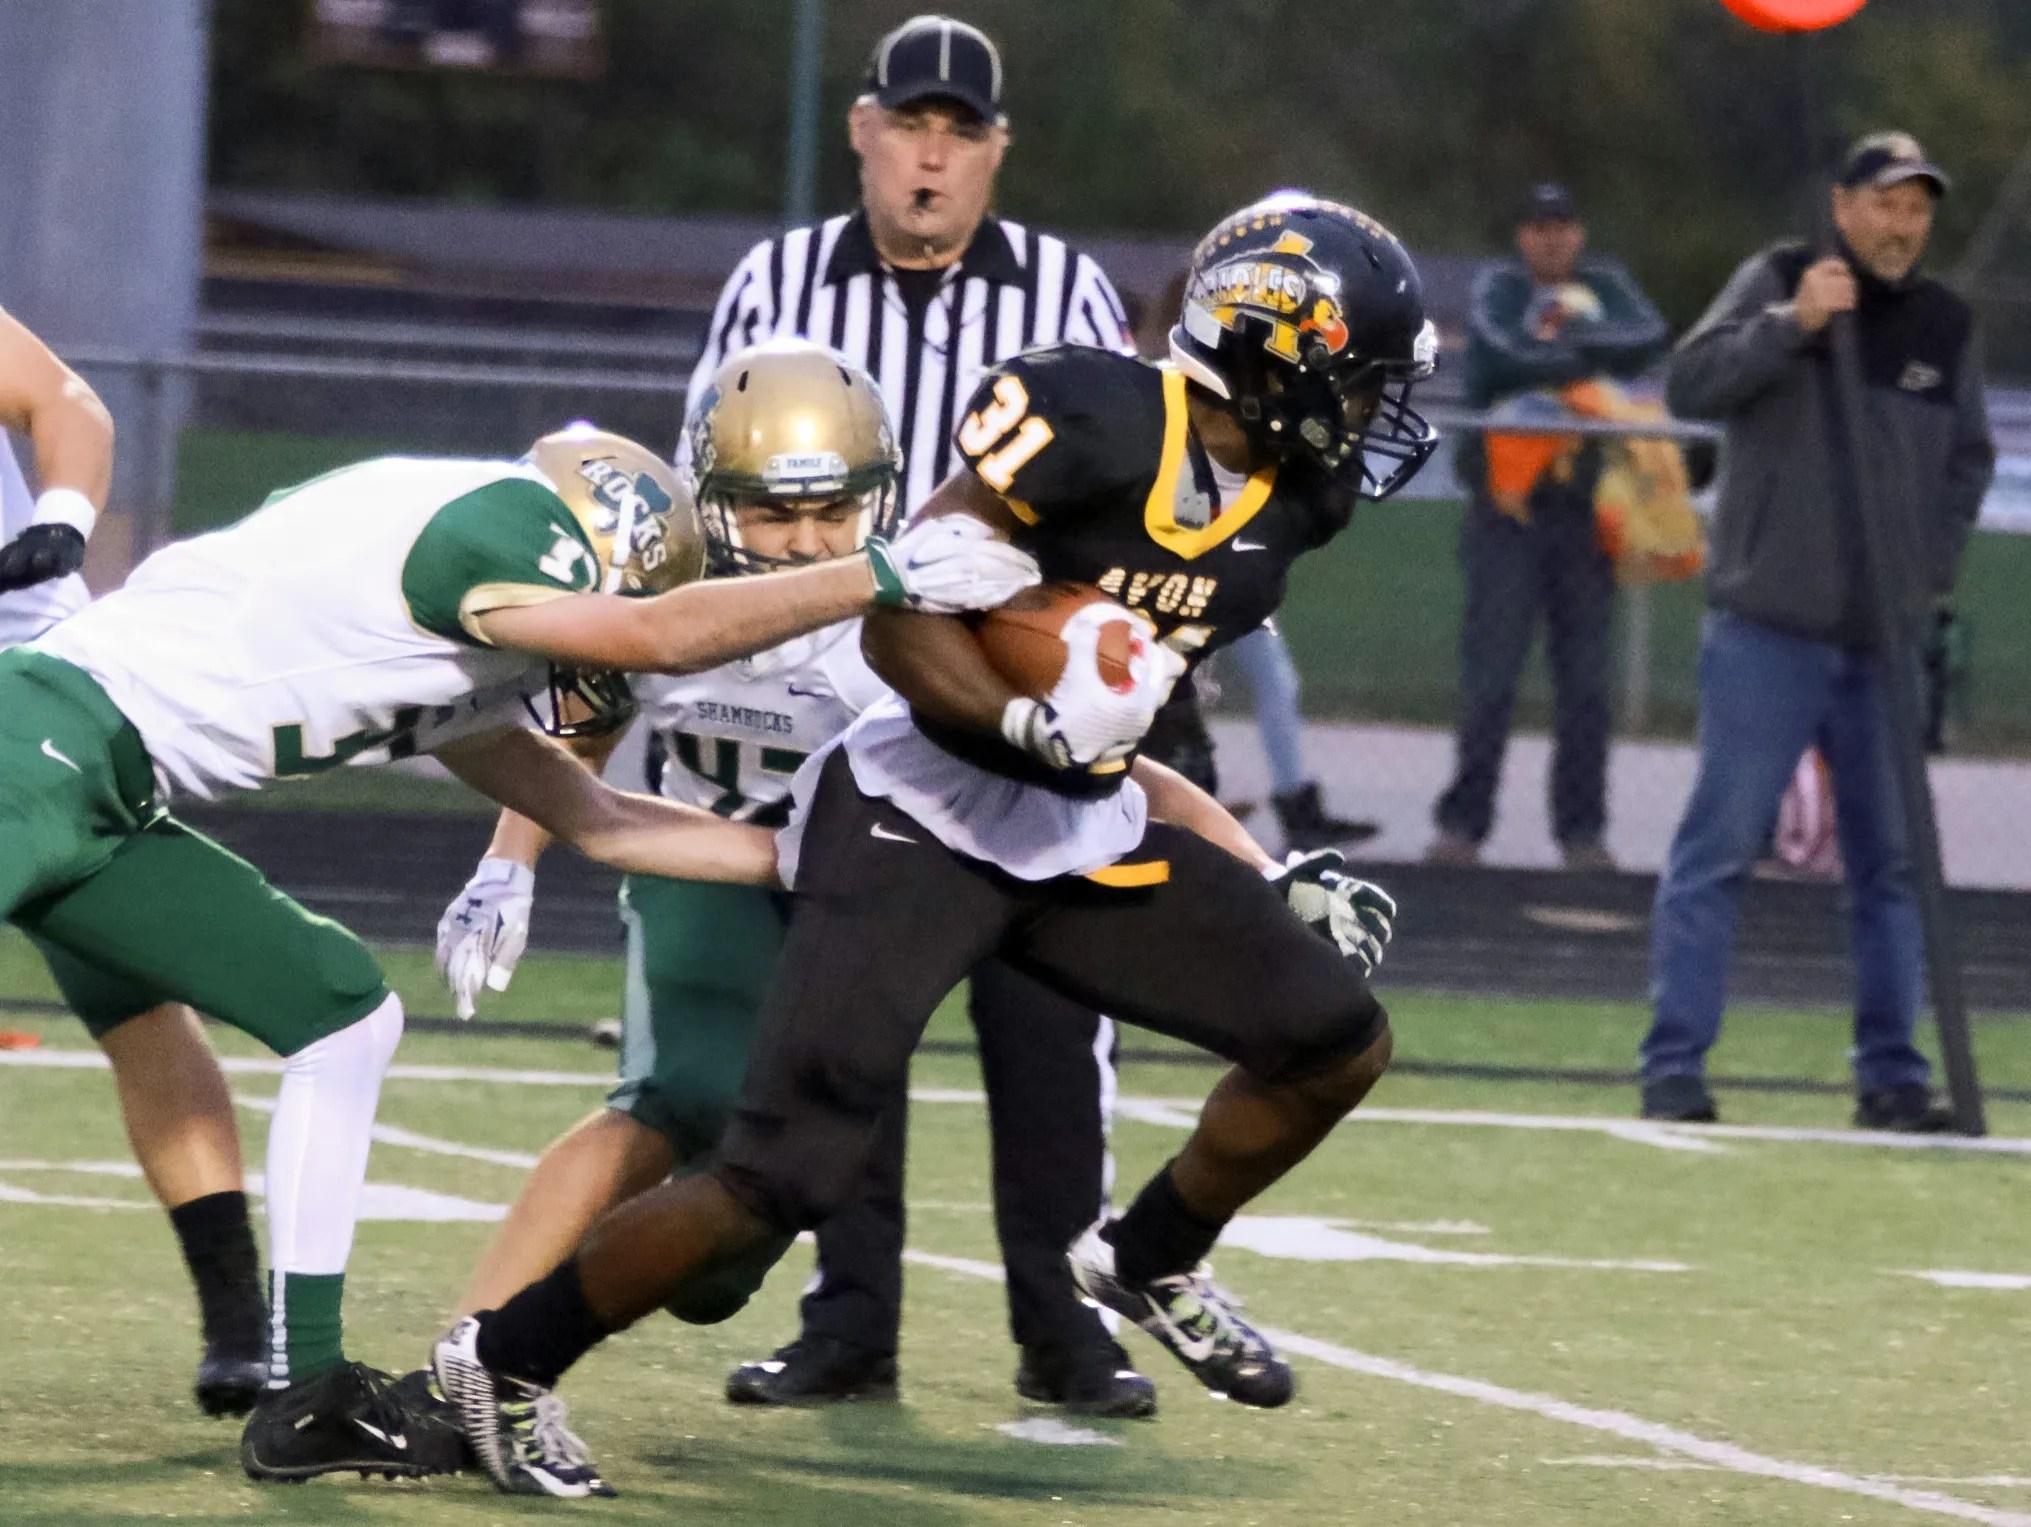 HS football: Avon keeps up winning streak, holds off